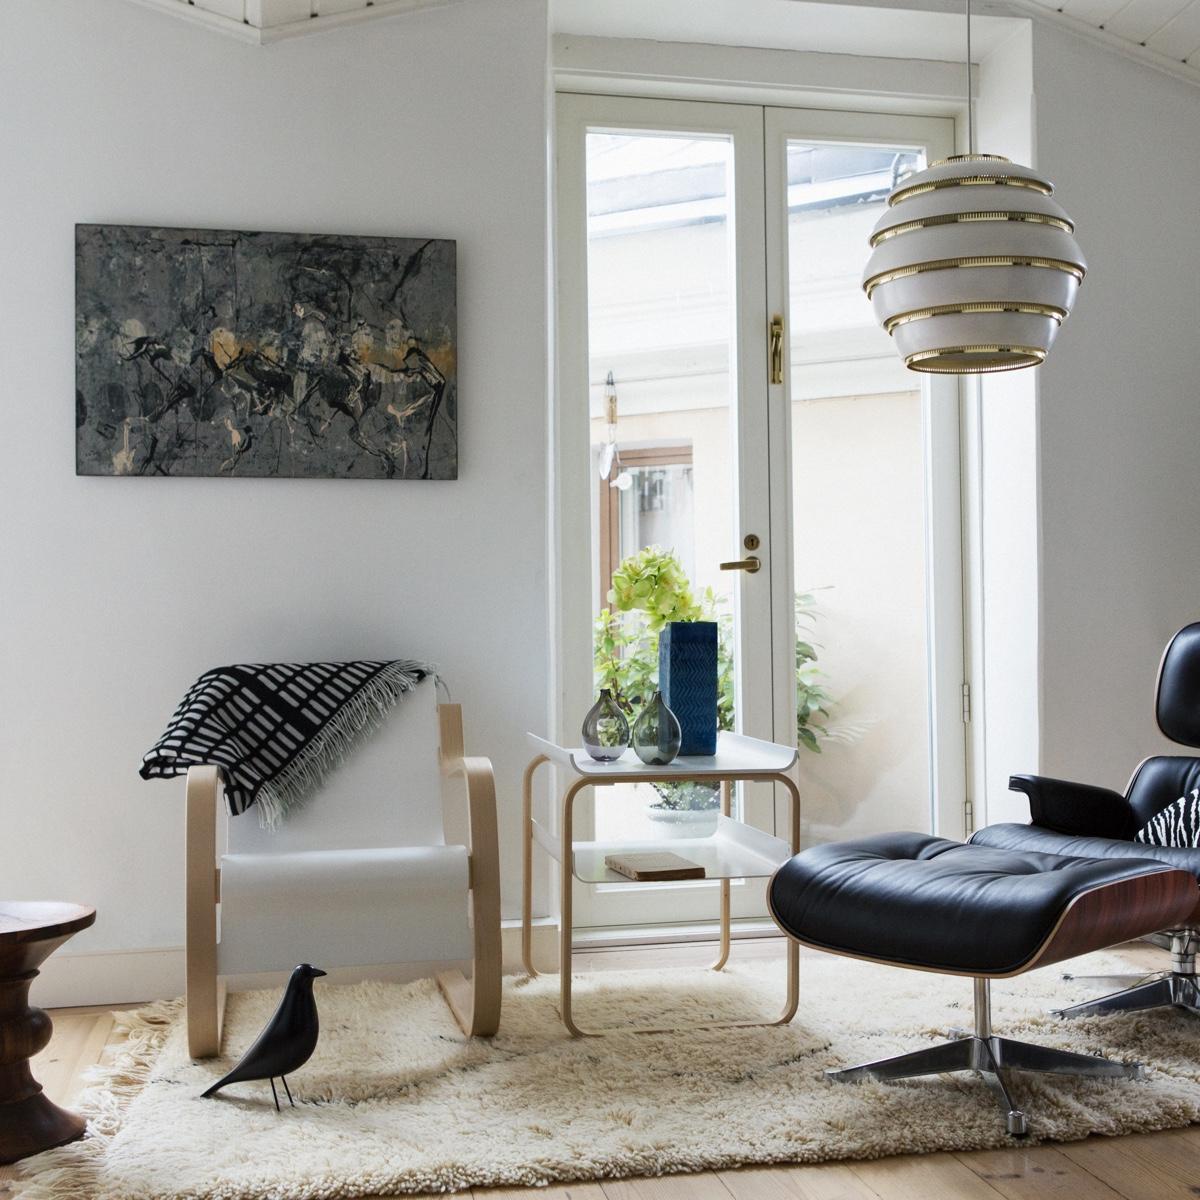 Finnish Design Genius Alvar Aalto Artek and the Aalto Vase